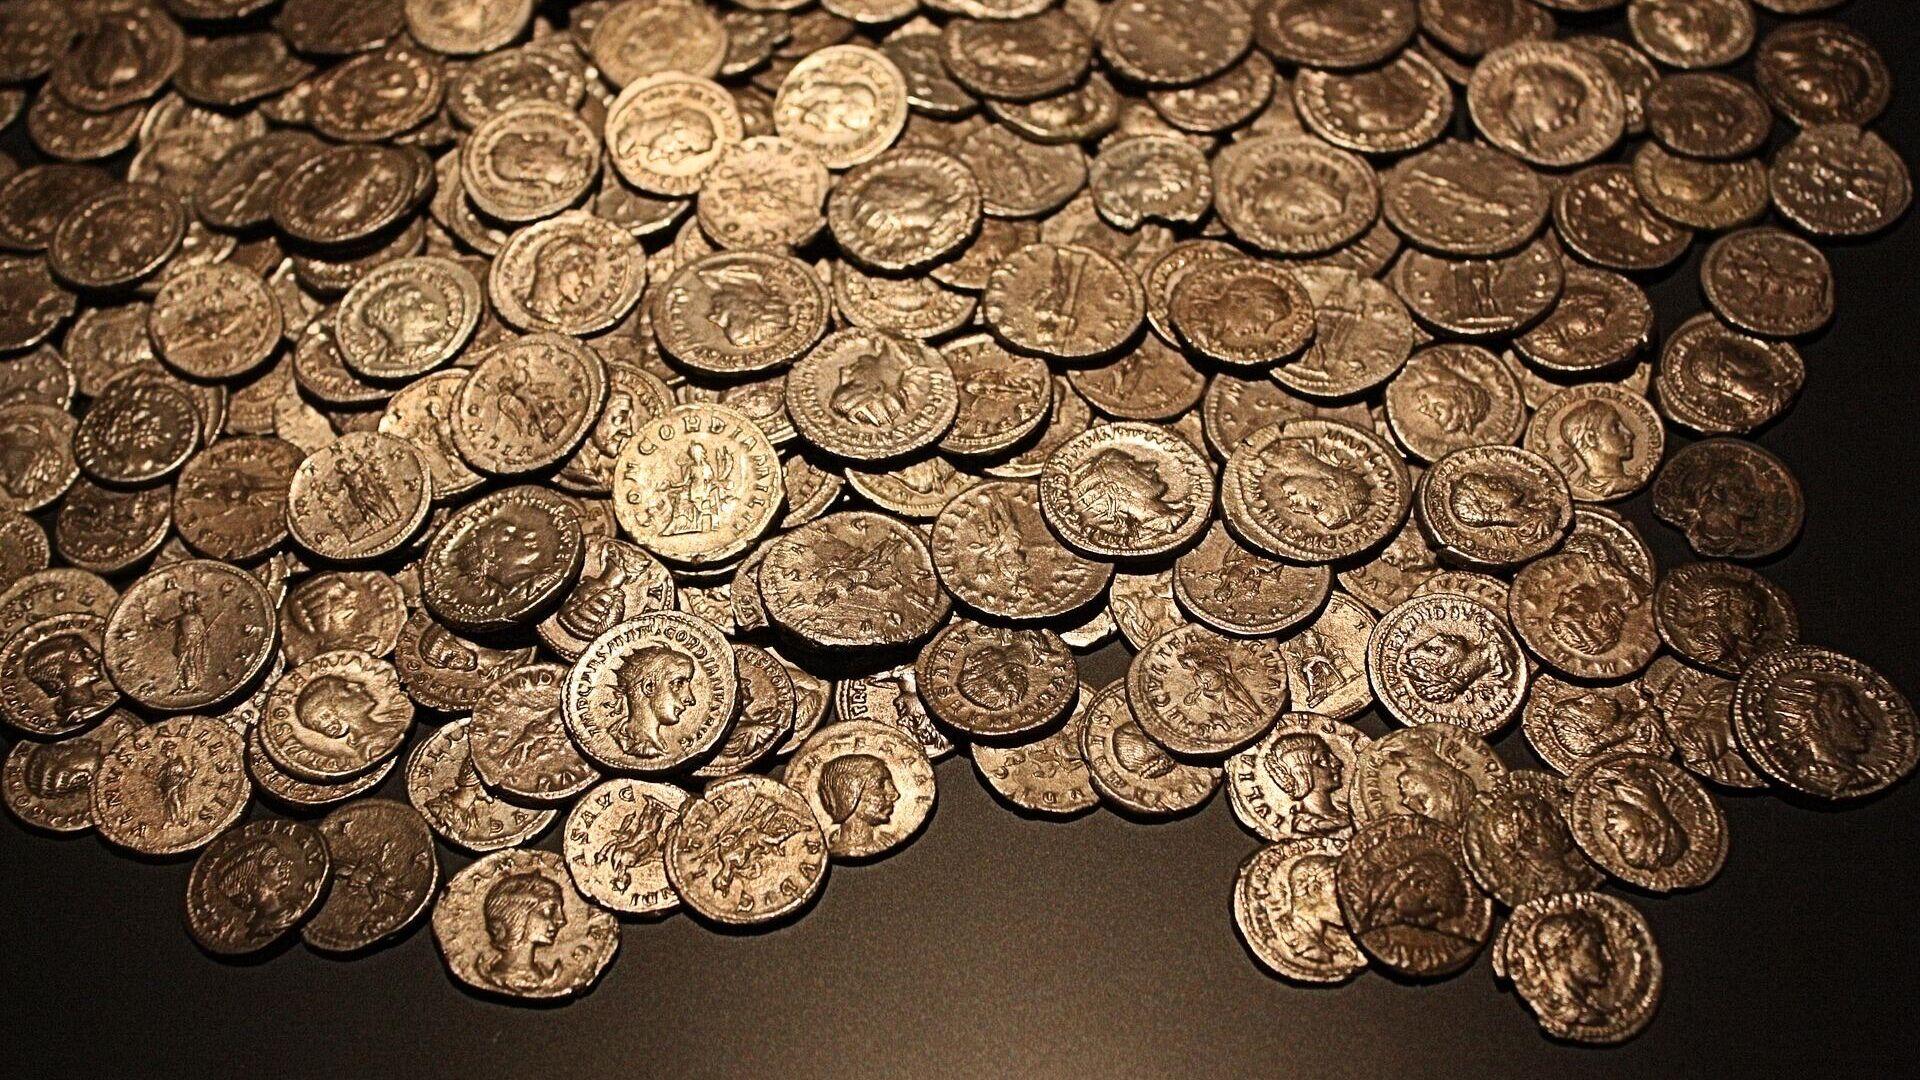 Goldmünzen (Symbolbild) - SNA, 1920, 21.09.2021